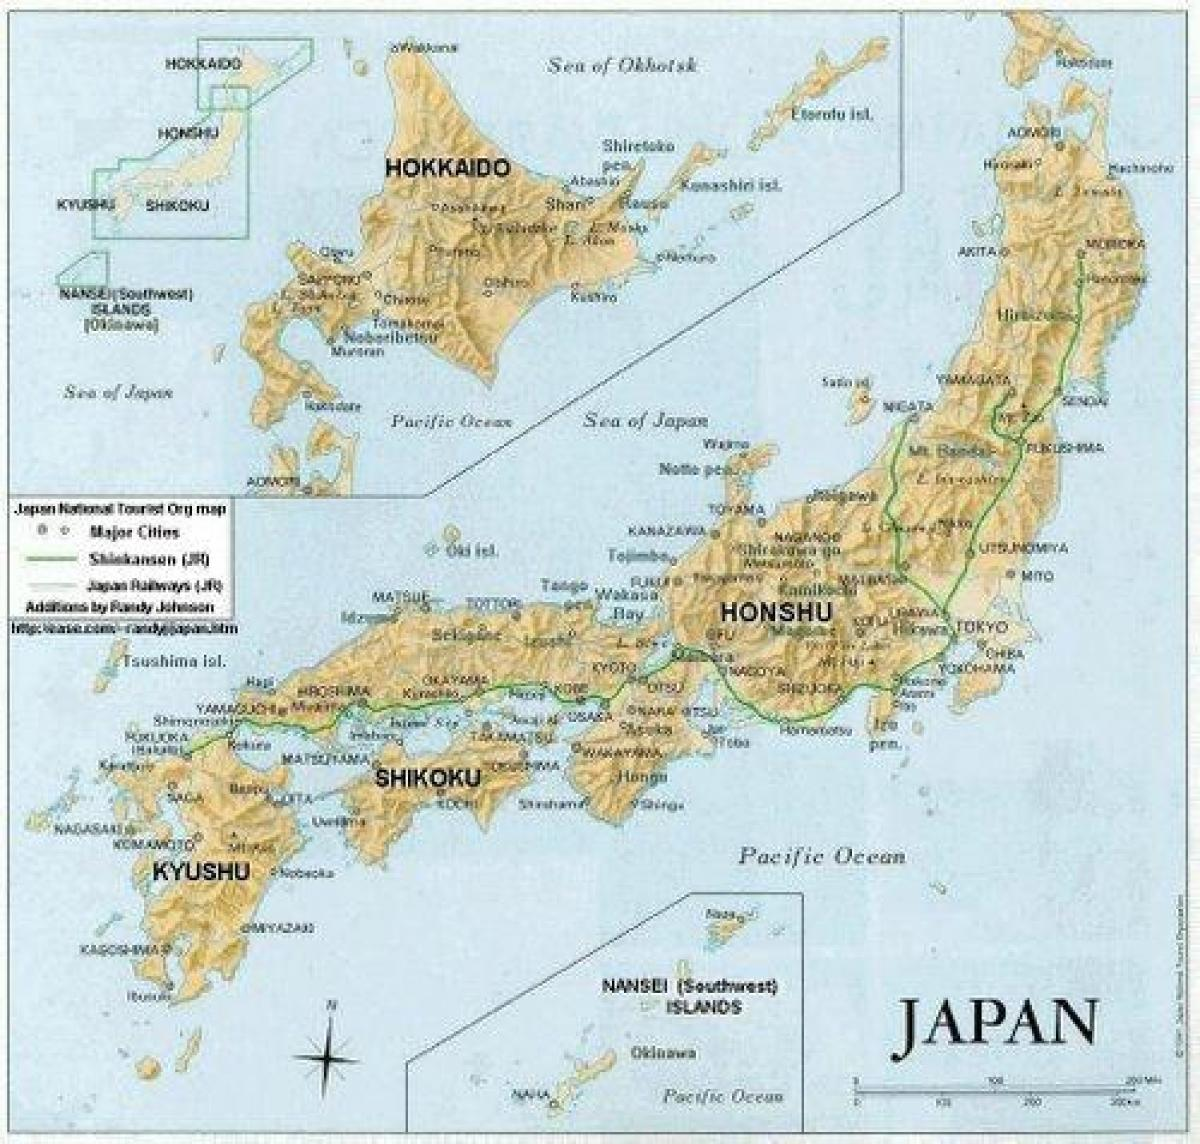 Cartina Dettagliata Giappone.Mappa Dettagliata Del Giappone Il Giappone Mappa Dettagliata Asia Orientale Asia